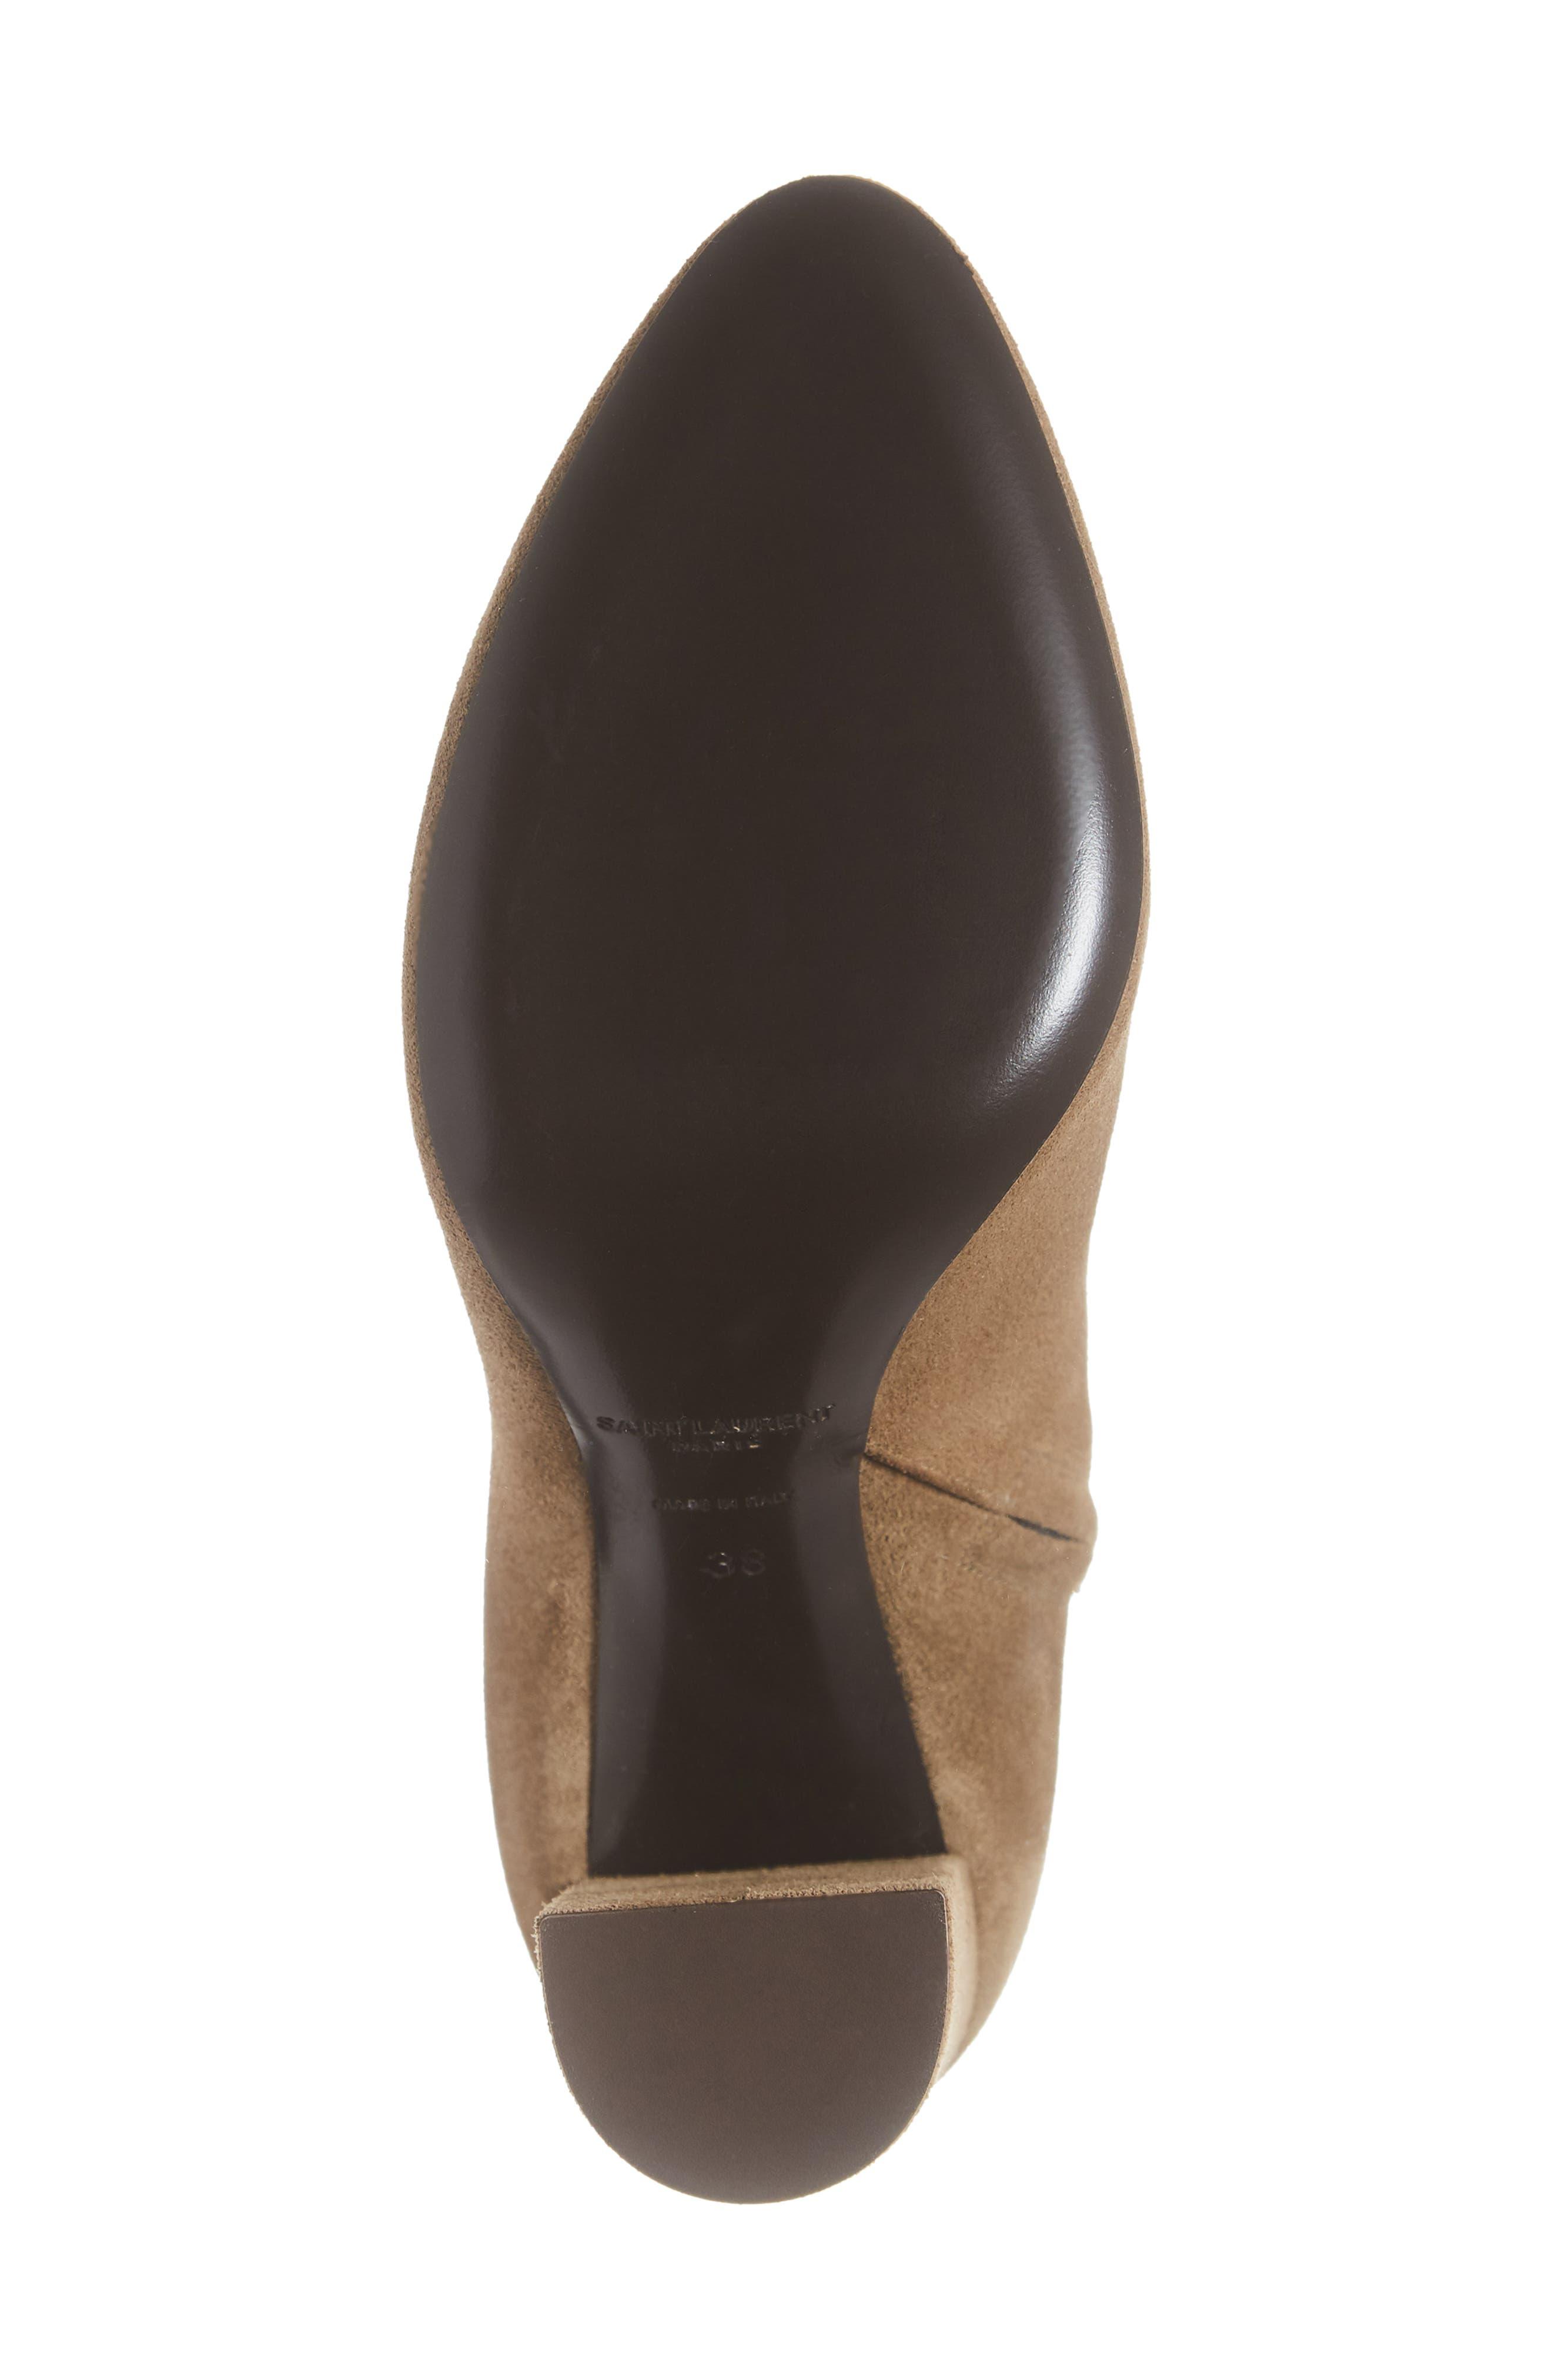 Lou Almond Toe Boot,                             Alternate thumbnail 6, color,                             LIGHT CIGAR SUEDE